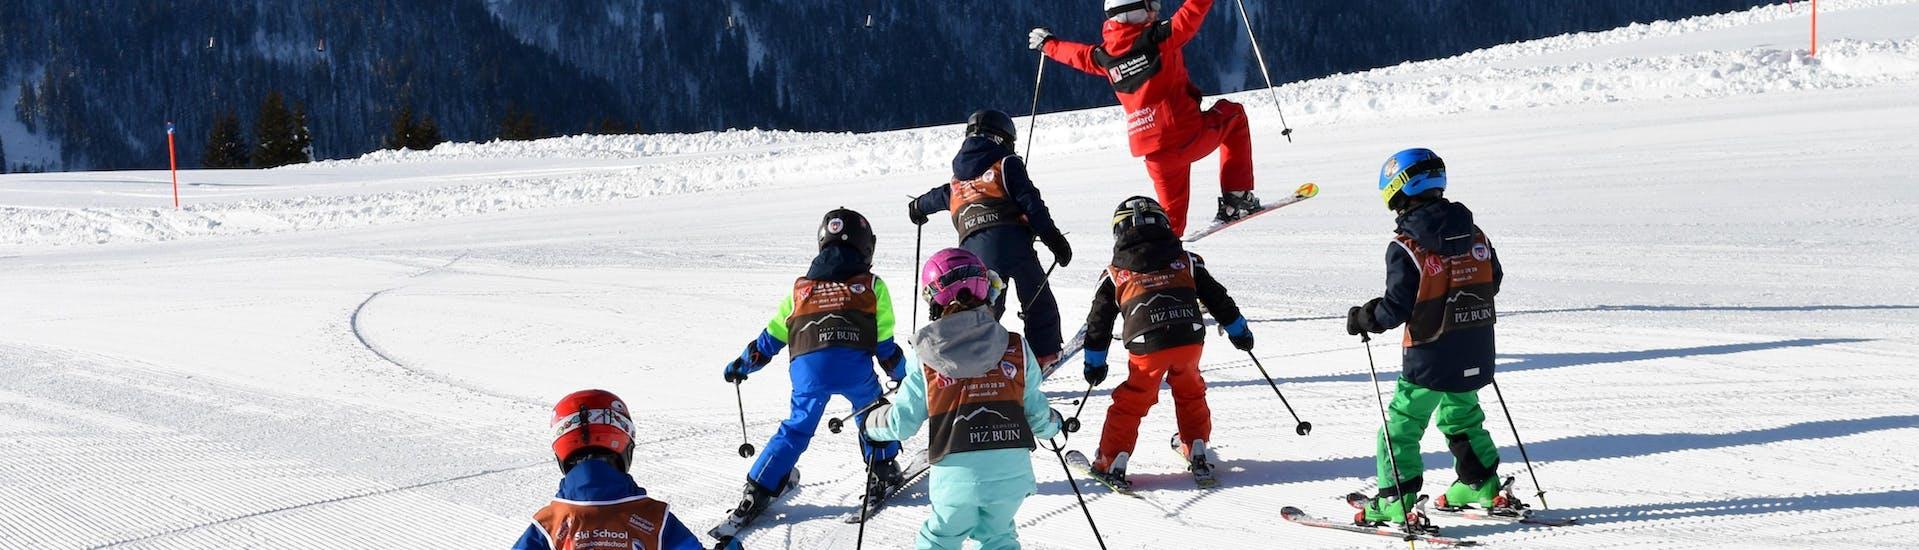 Kids Ski Lessons (6-16 y.) for Advanced Skiers